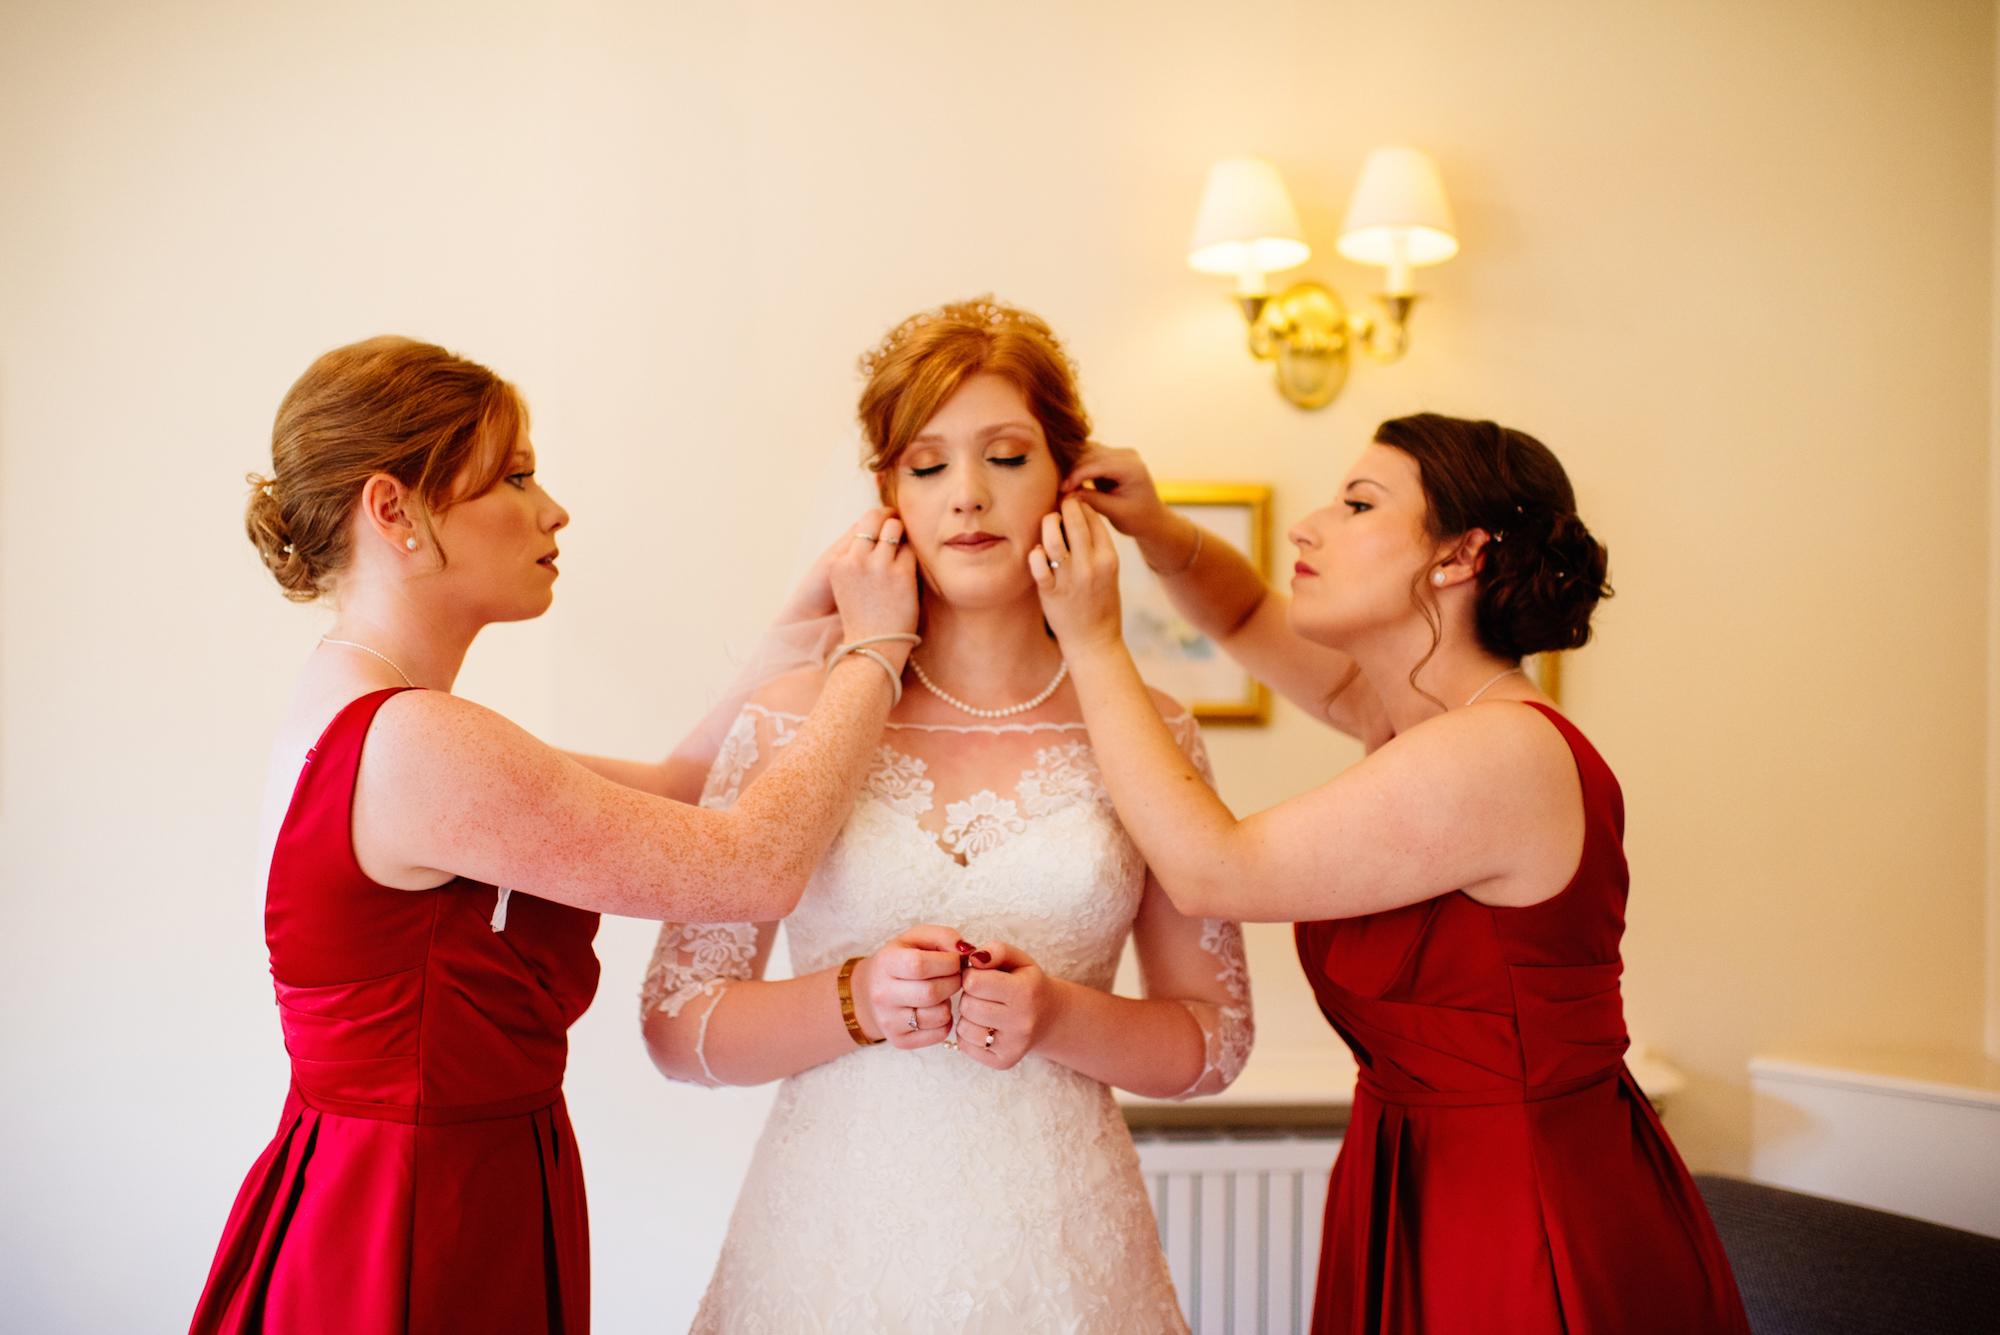 102 Bride Groom London Wedding Photographer Photography.jpg